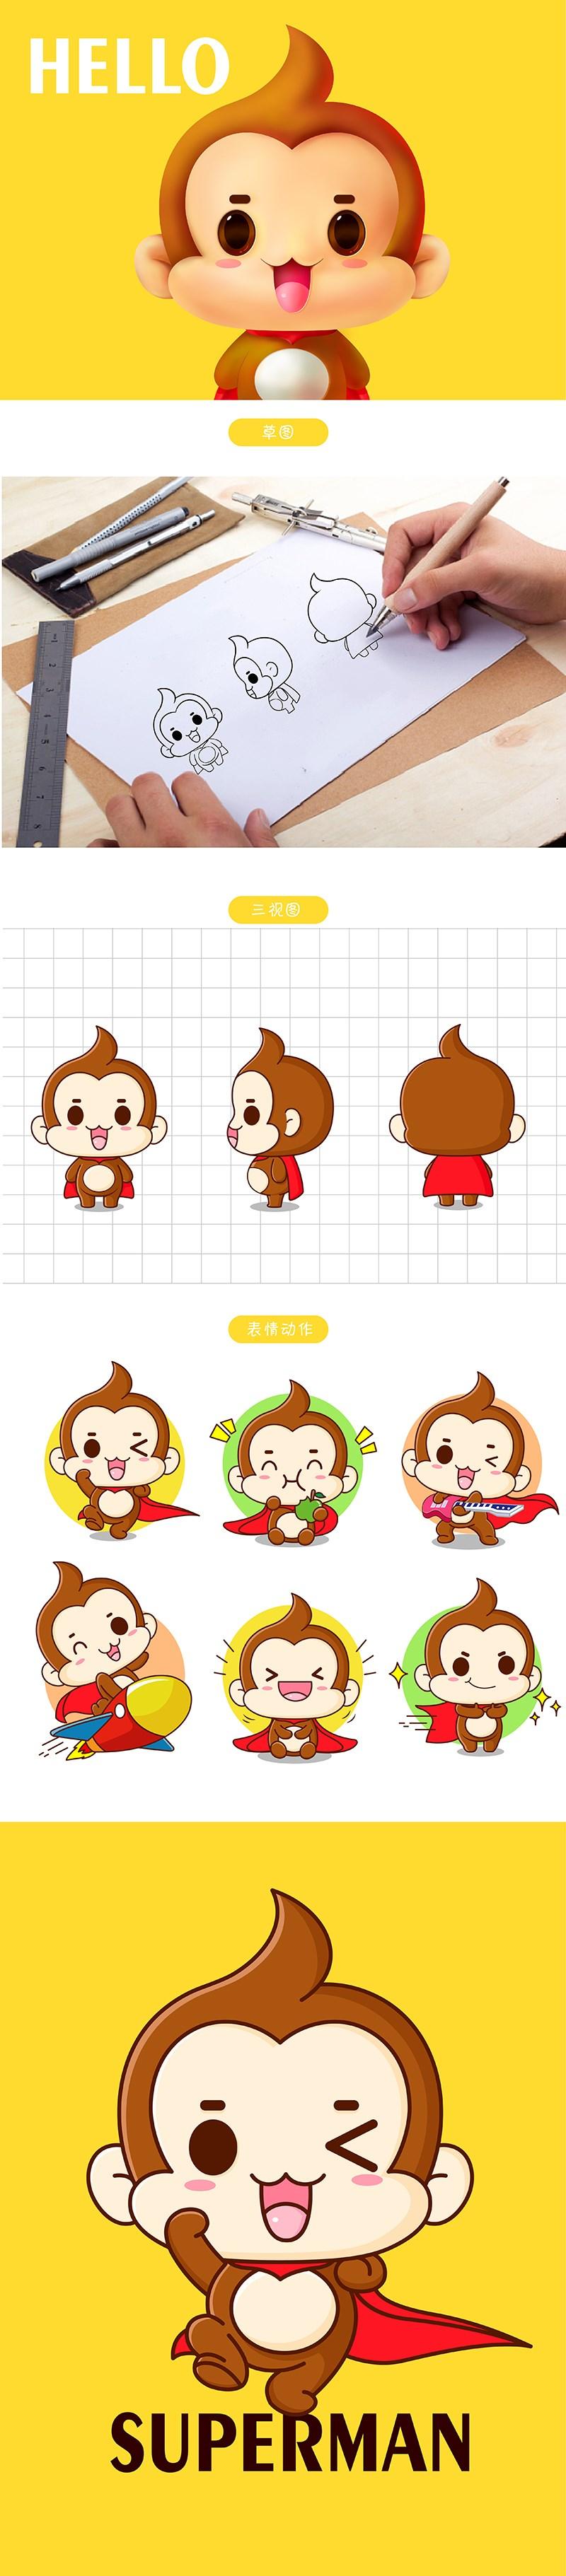 Meekey吉祥物卡通形象设计微信表情包gif茁茁猫设计